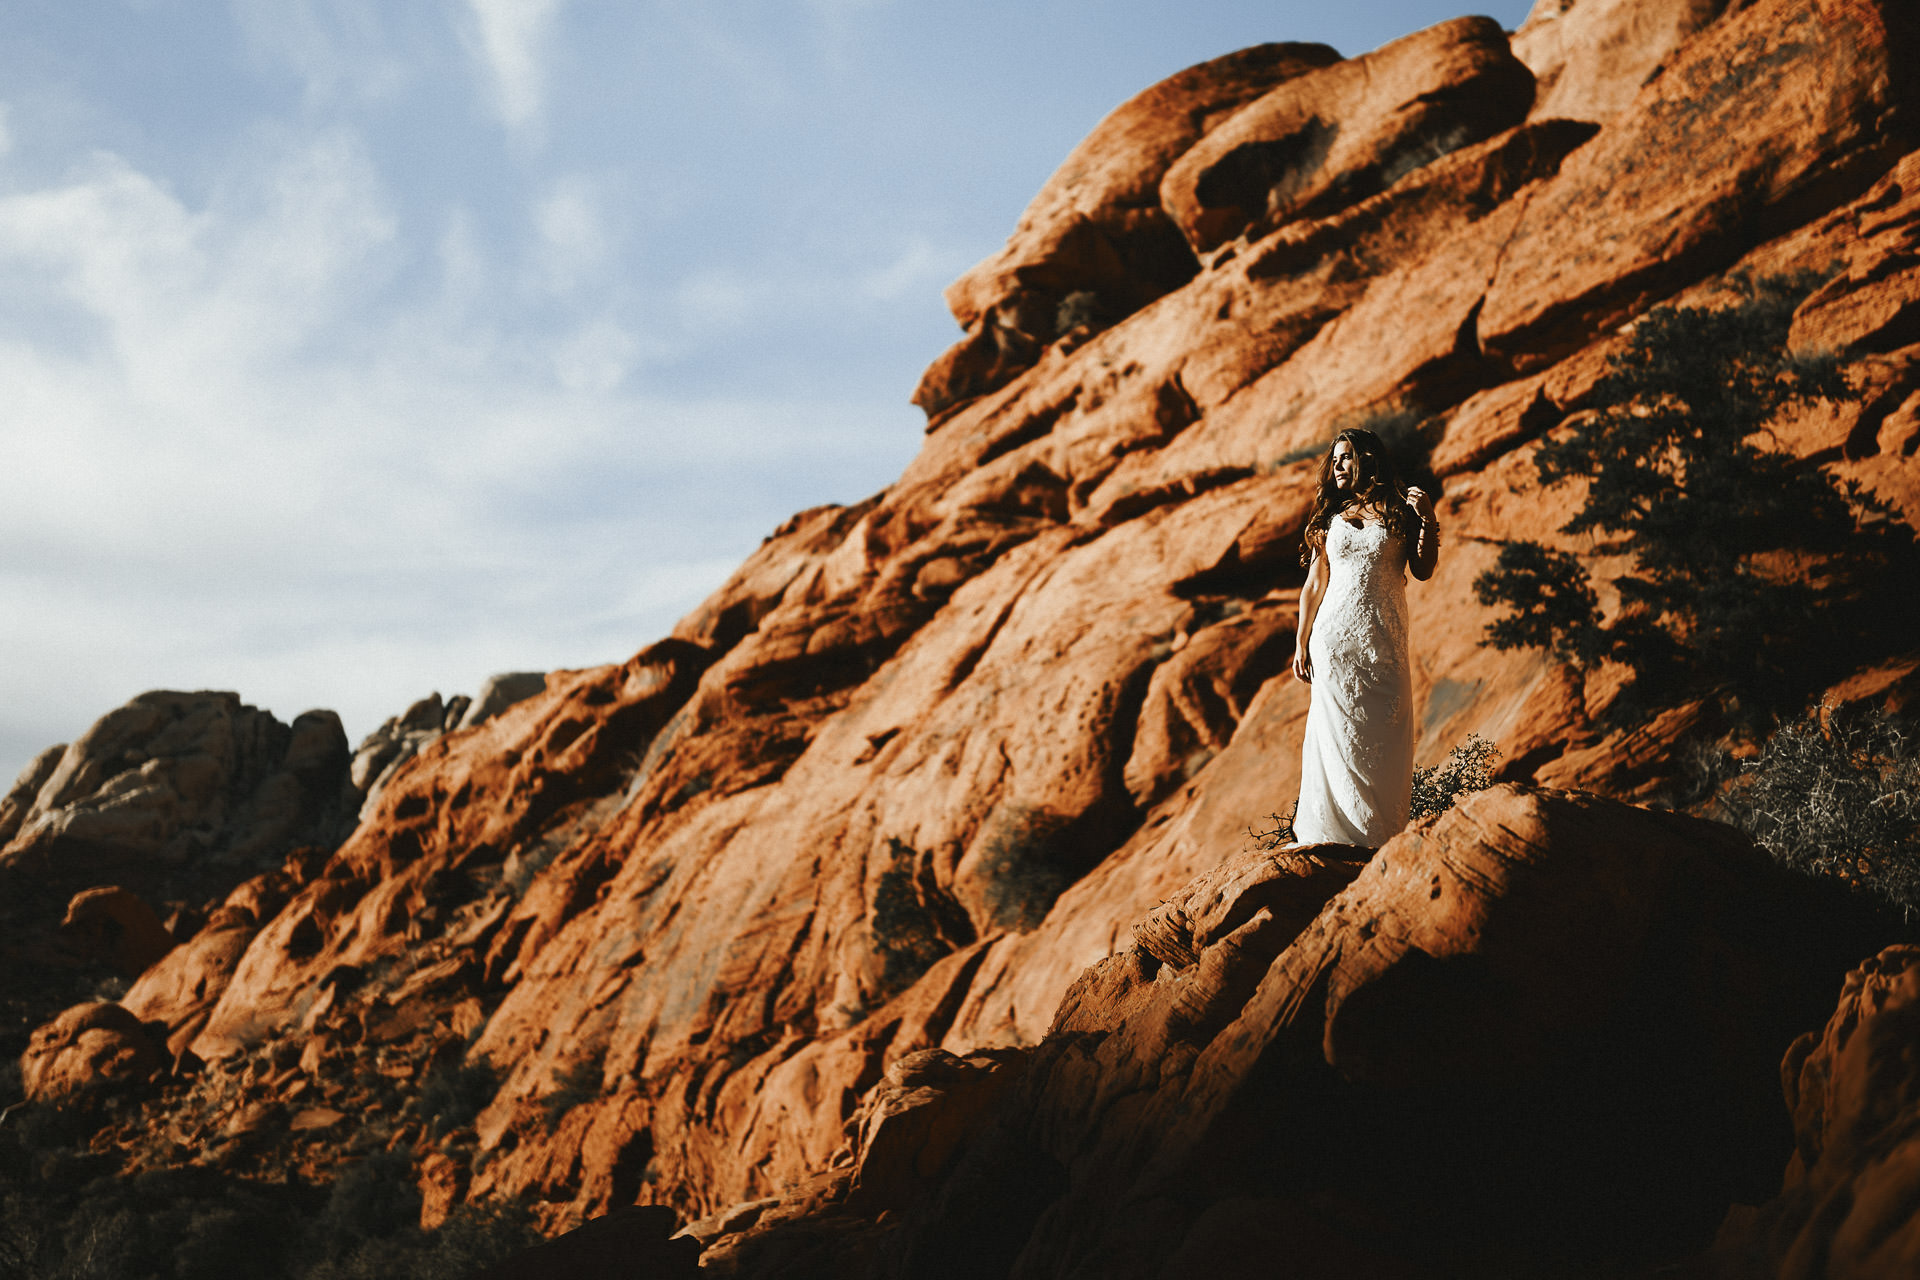 Twisted-Oaks-Studio-wppi-leica-red-rock-canyon-13.jpg